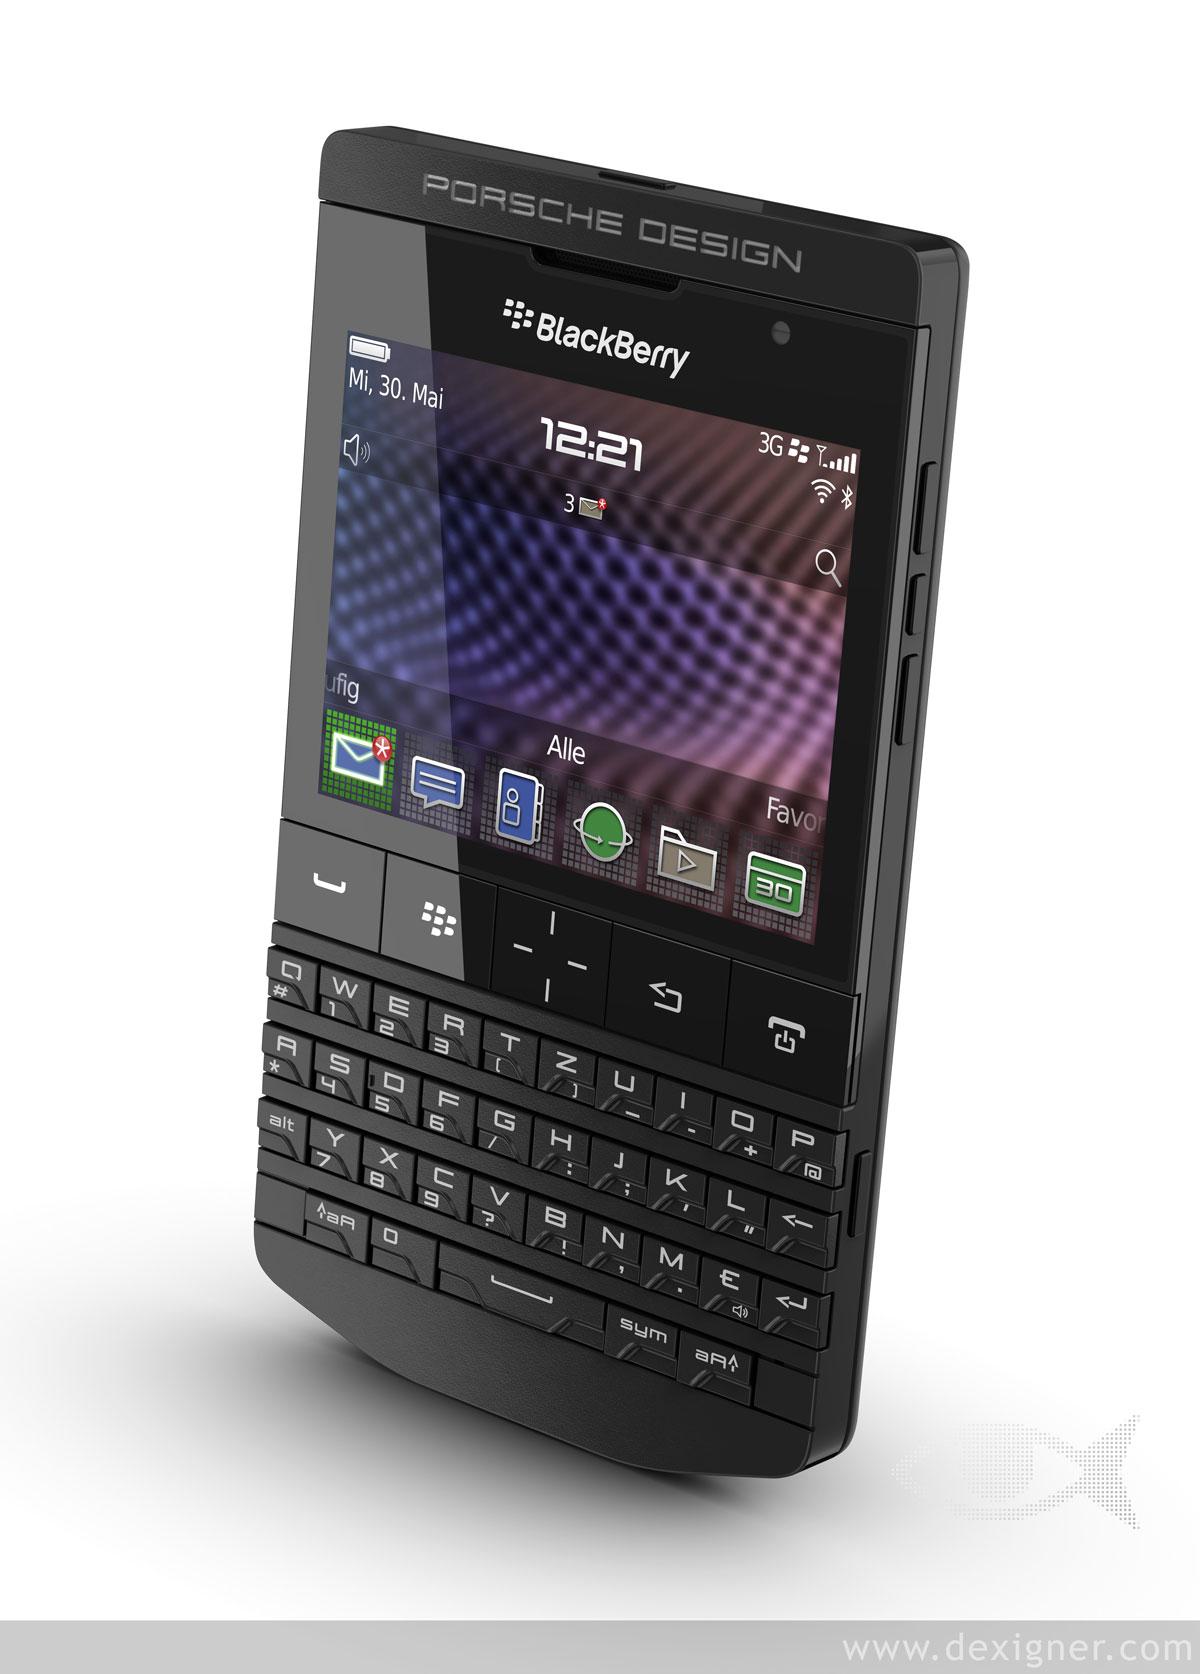 porsche design s p 9981 blackberry matte black extravaganzi. Black Bedroom Furniture Sets. Home Design Ideas